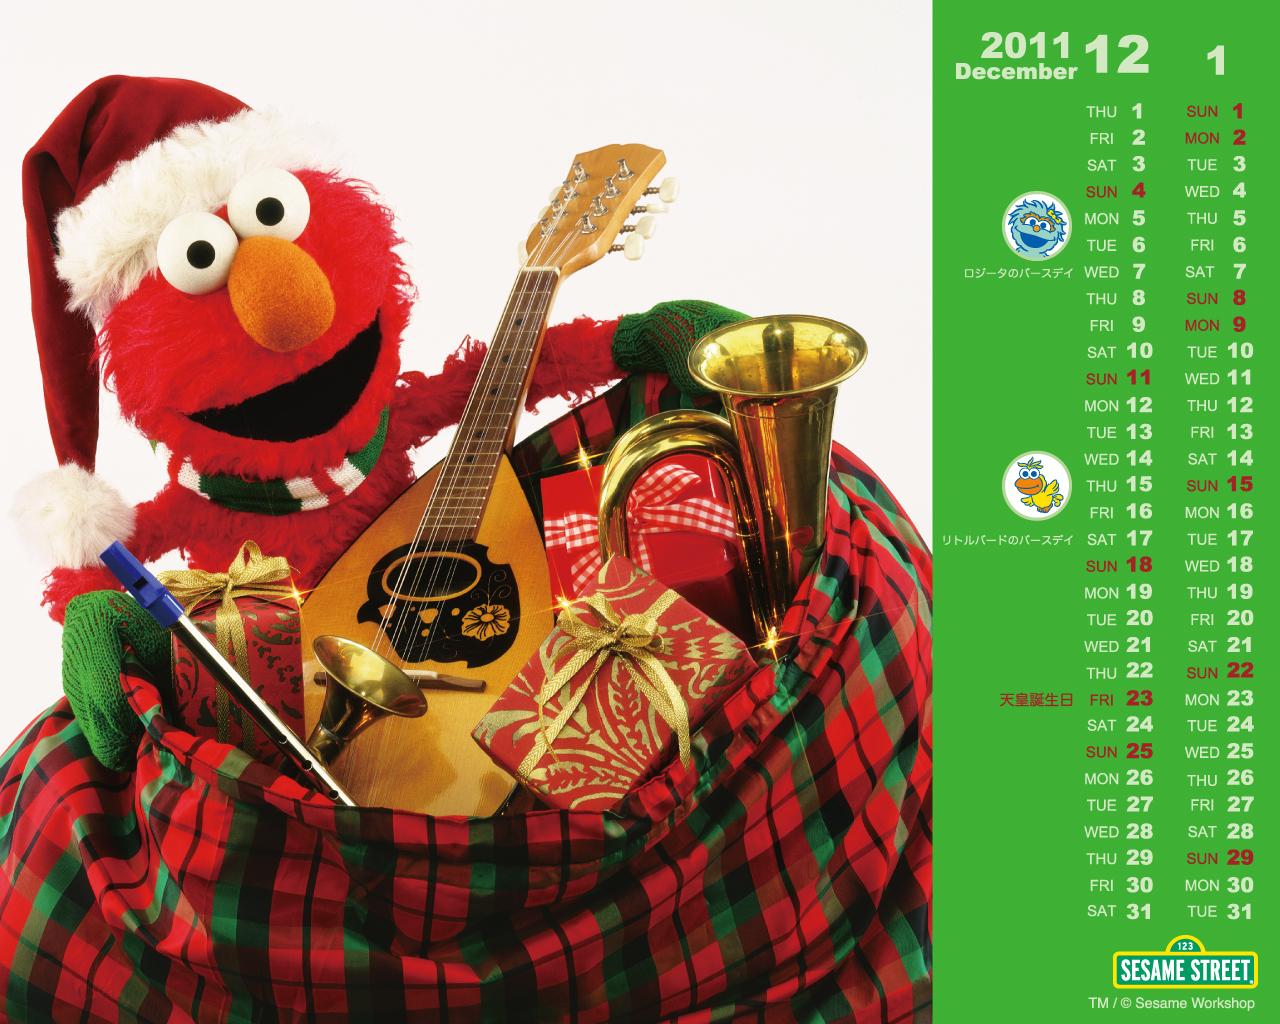 Sesame Street Fun Wallpaper